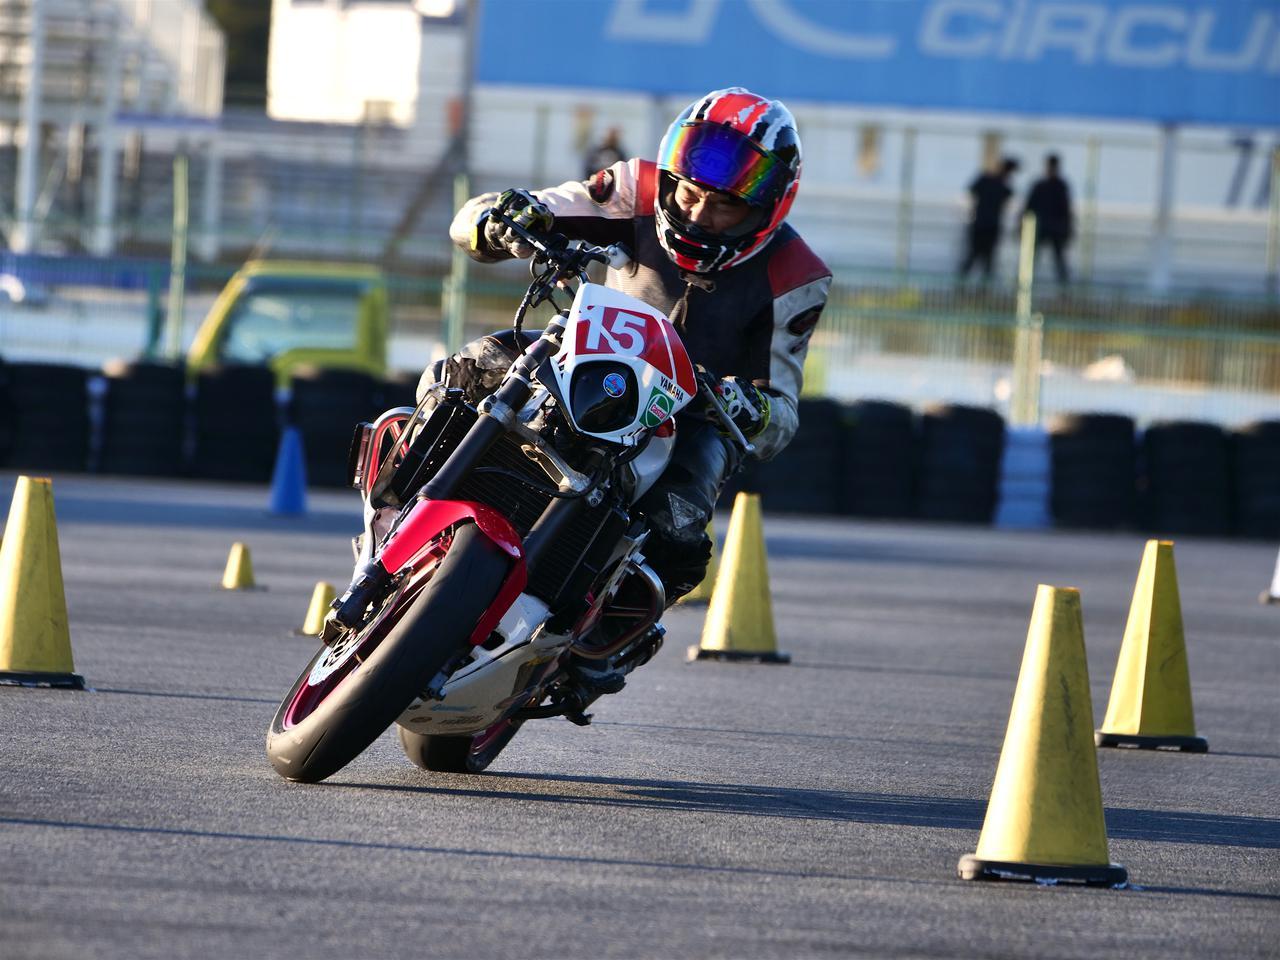 Images : 16番目の画像 - 2019ダンロップ・オートバイ杯ジムカーナ第5戦 - webオートバイ